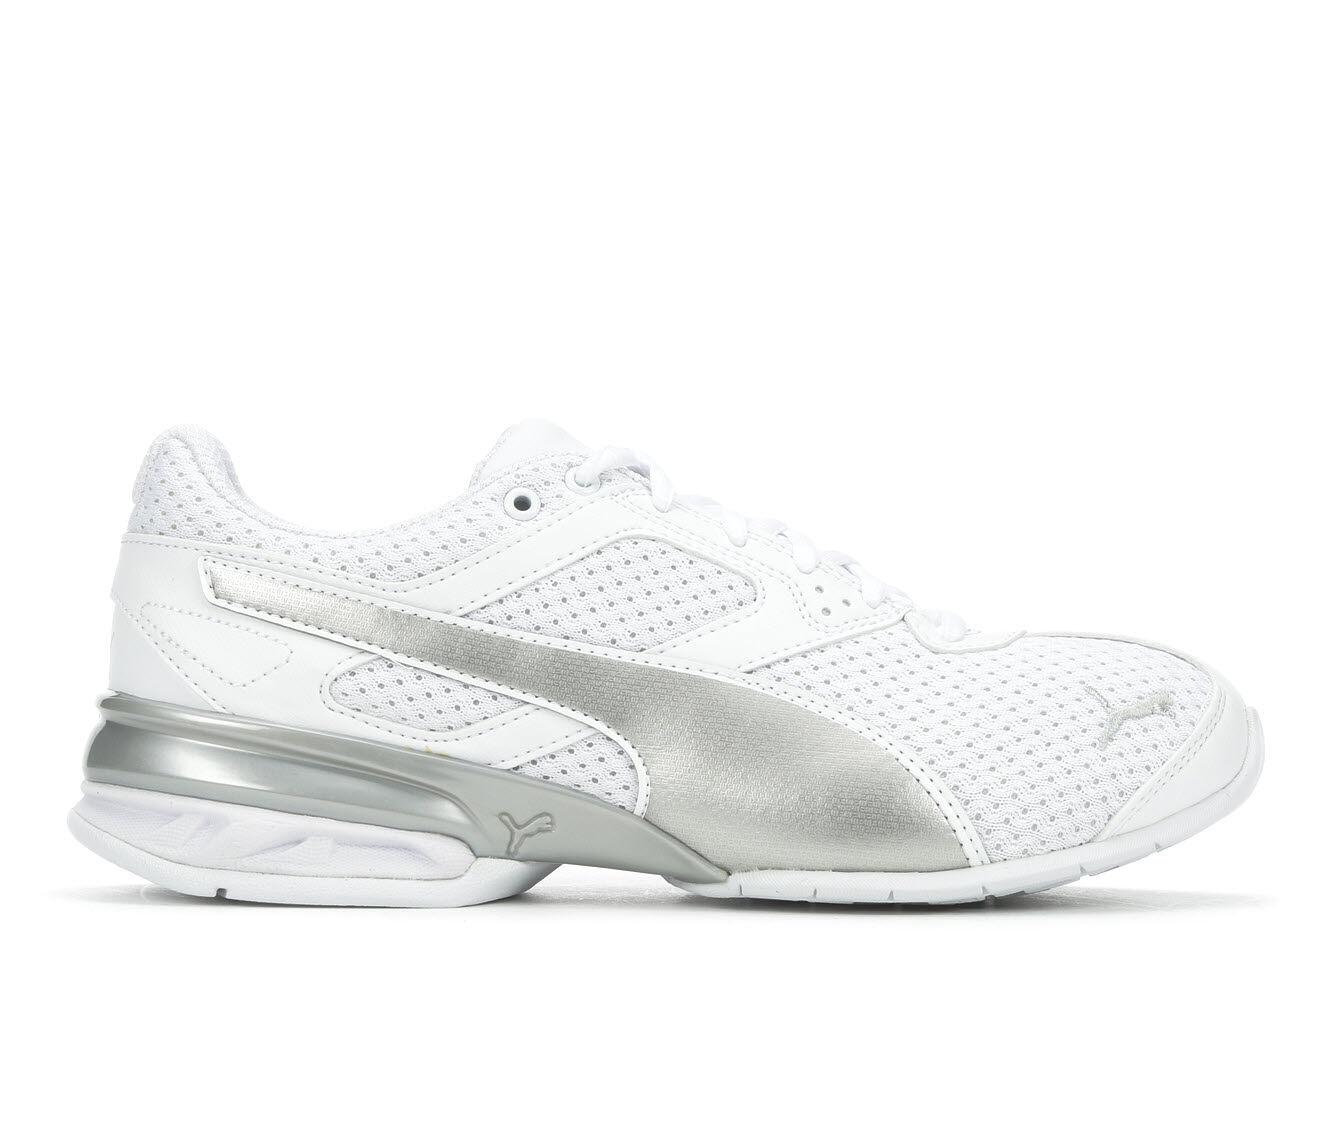 shop cheap new arrivals Women's Puma Tazon 6 Knit Sneakers White/Grey